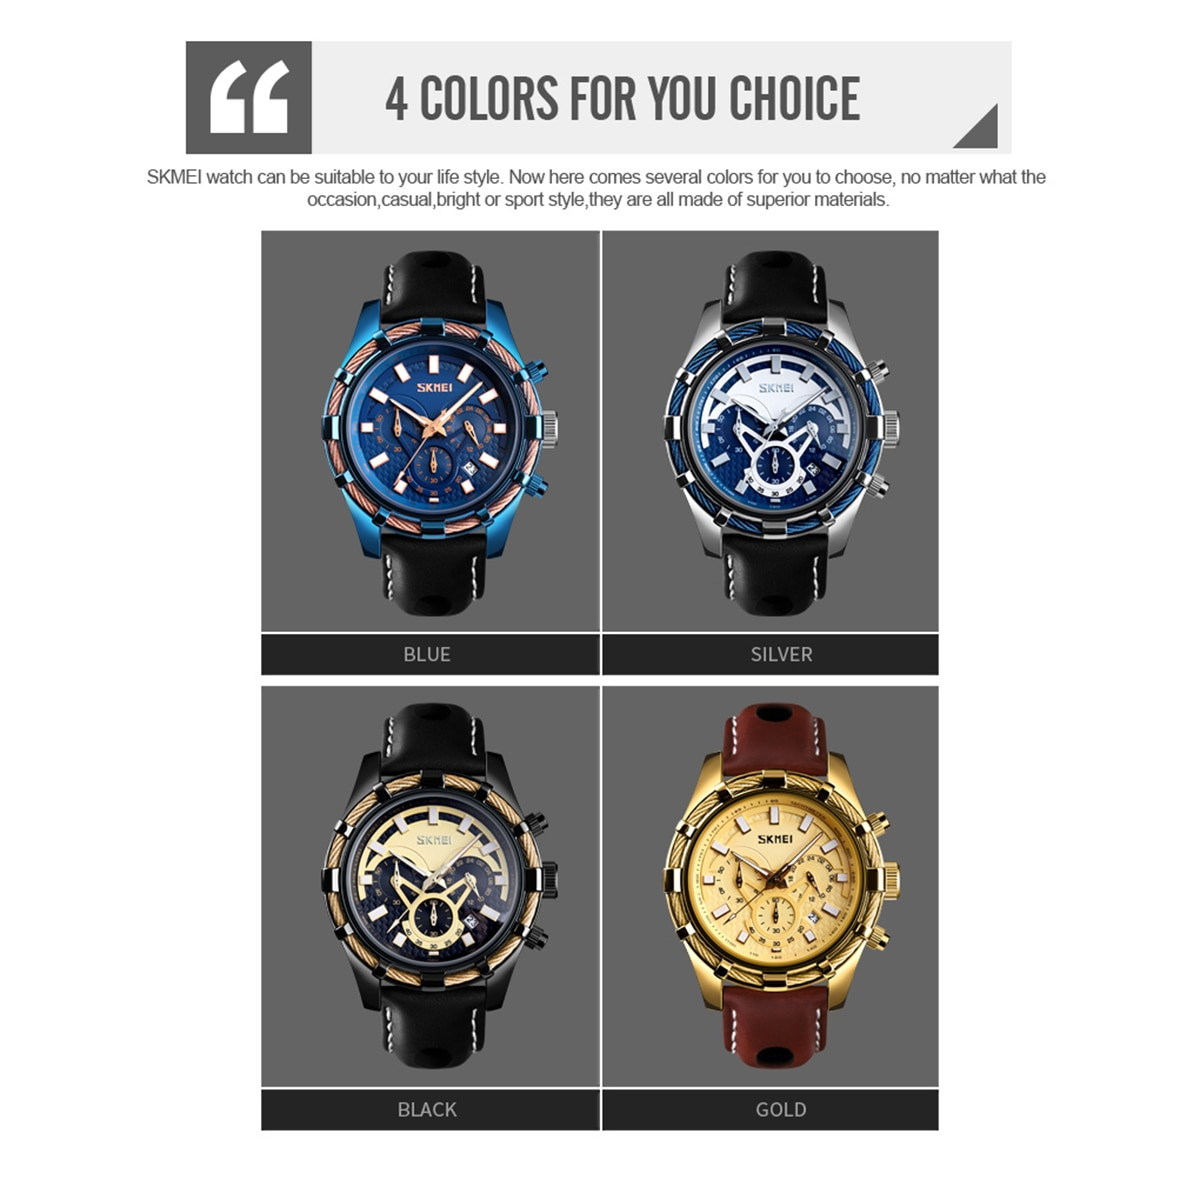 Luxury Fashion Sports Waterproof Watch Men Analog Digital Military Silicone Army Watch Leather Strap Luminous Quartz Wrist Watch